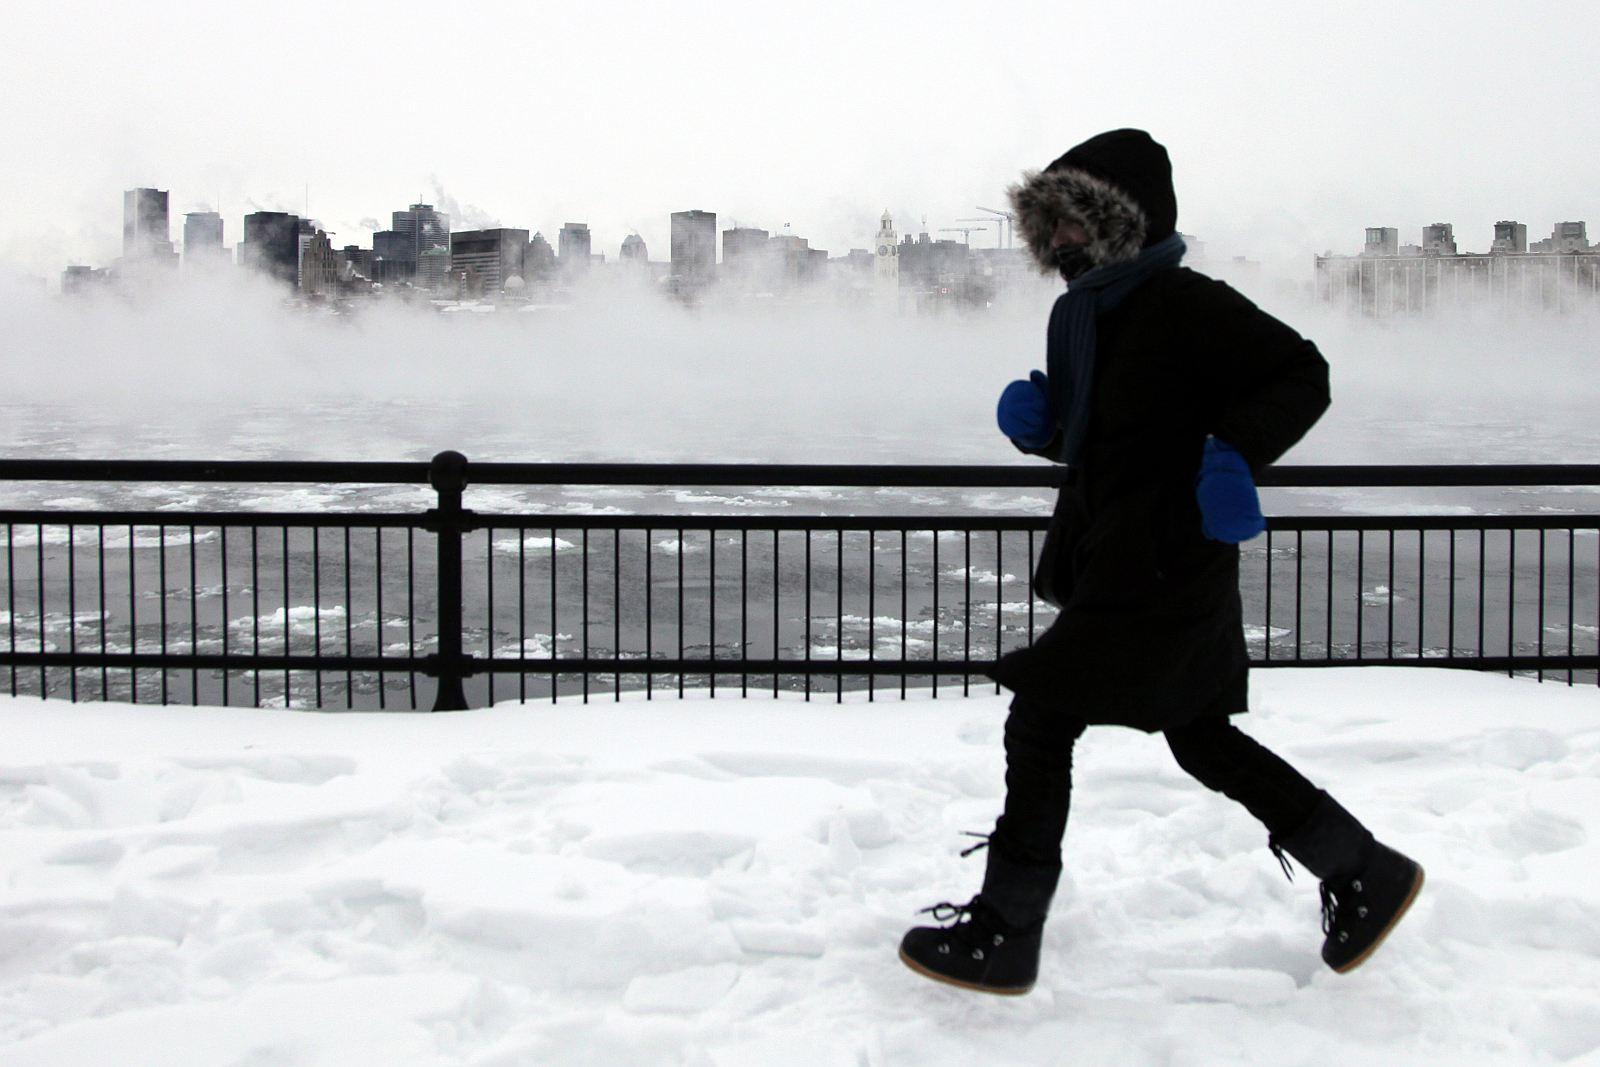 Montreal January weather is cooooold.